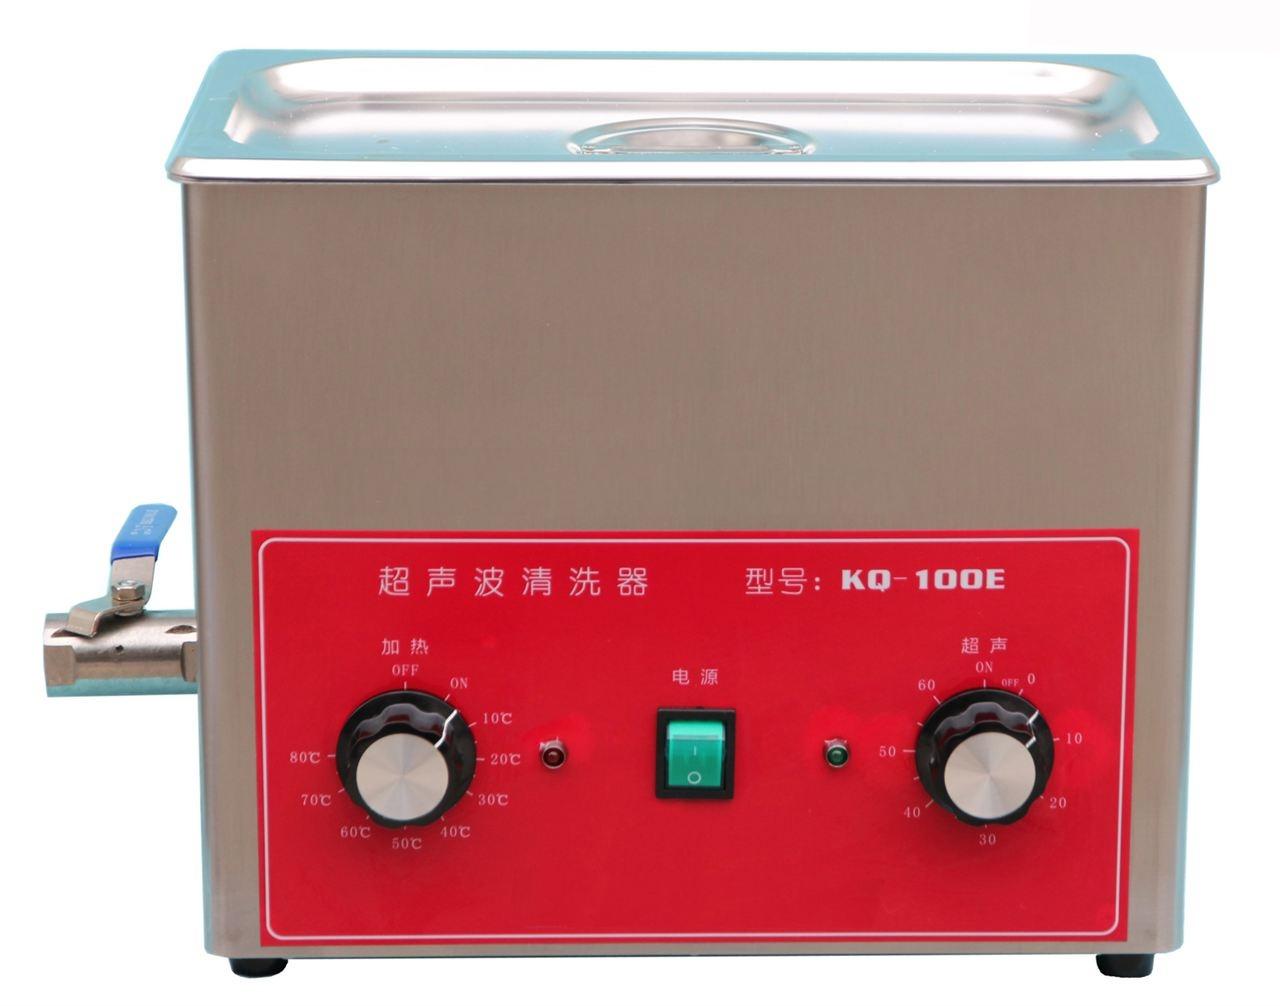 KQ-100E旋鈕型臺式超聲波清洗器